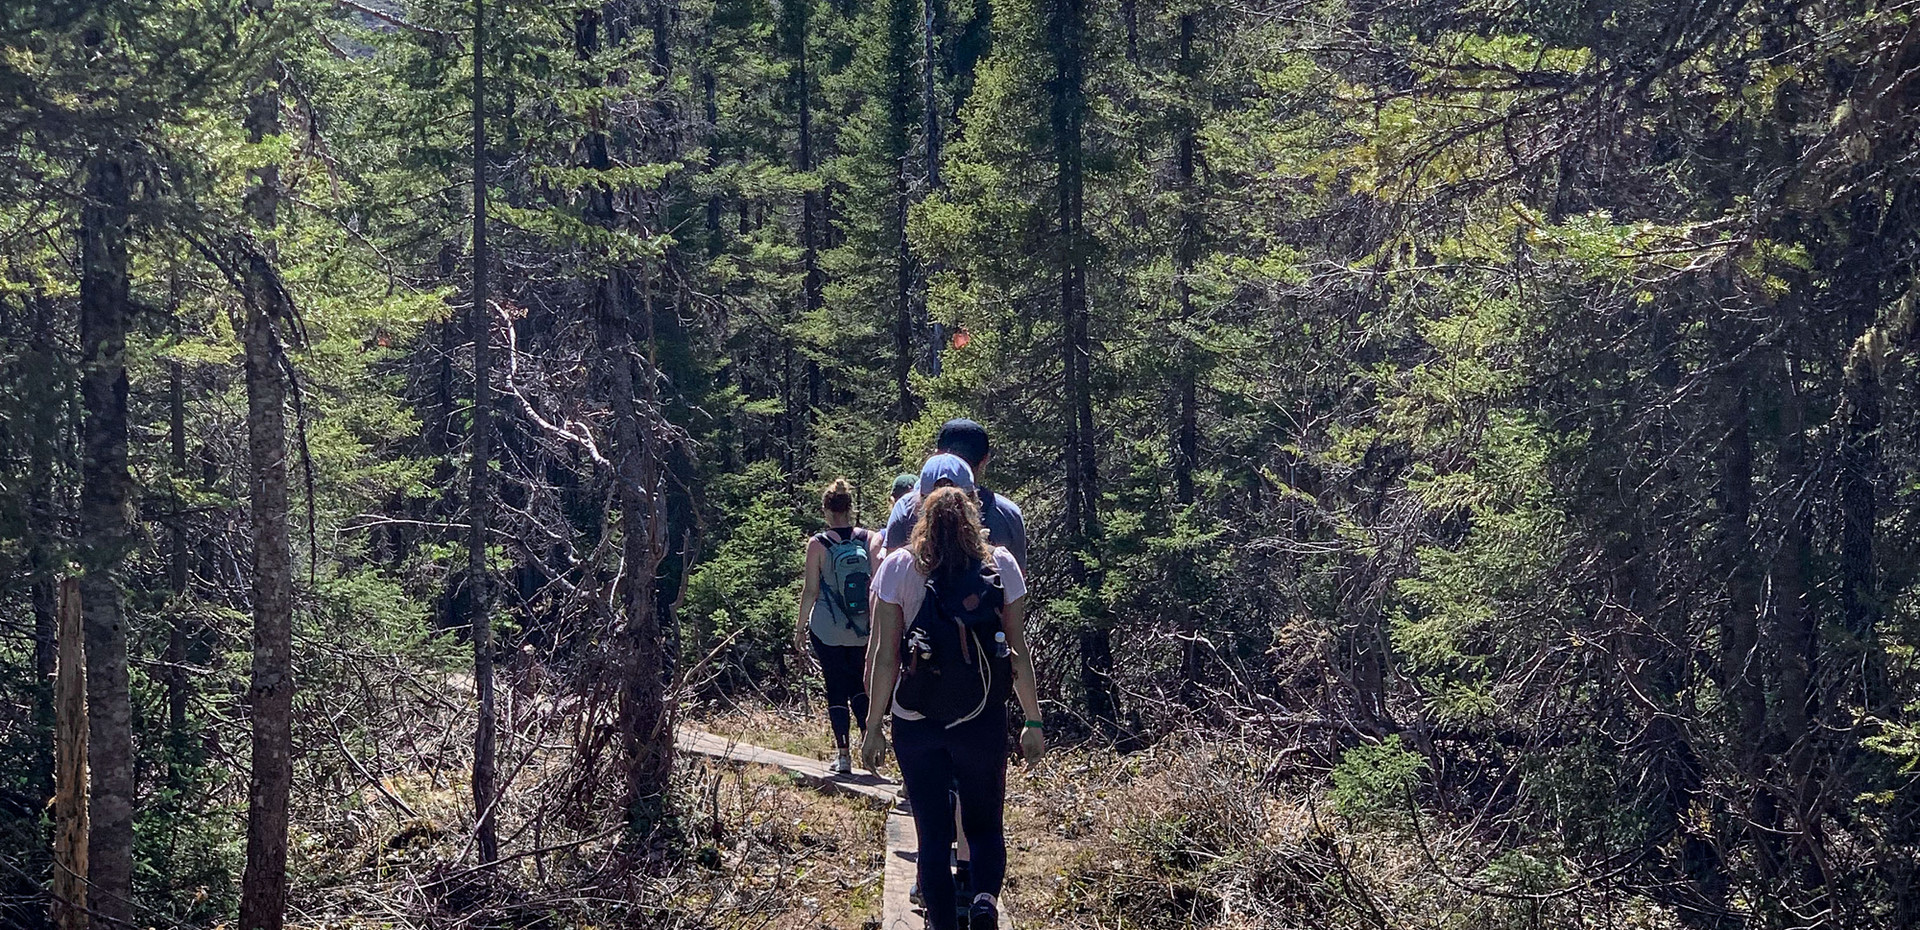 Explore Gaspesie National park